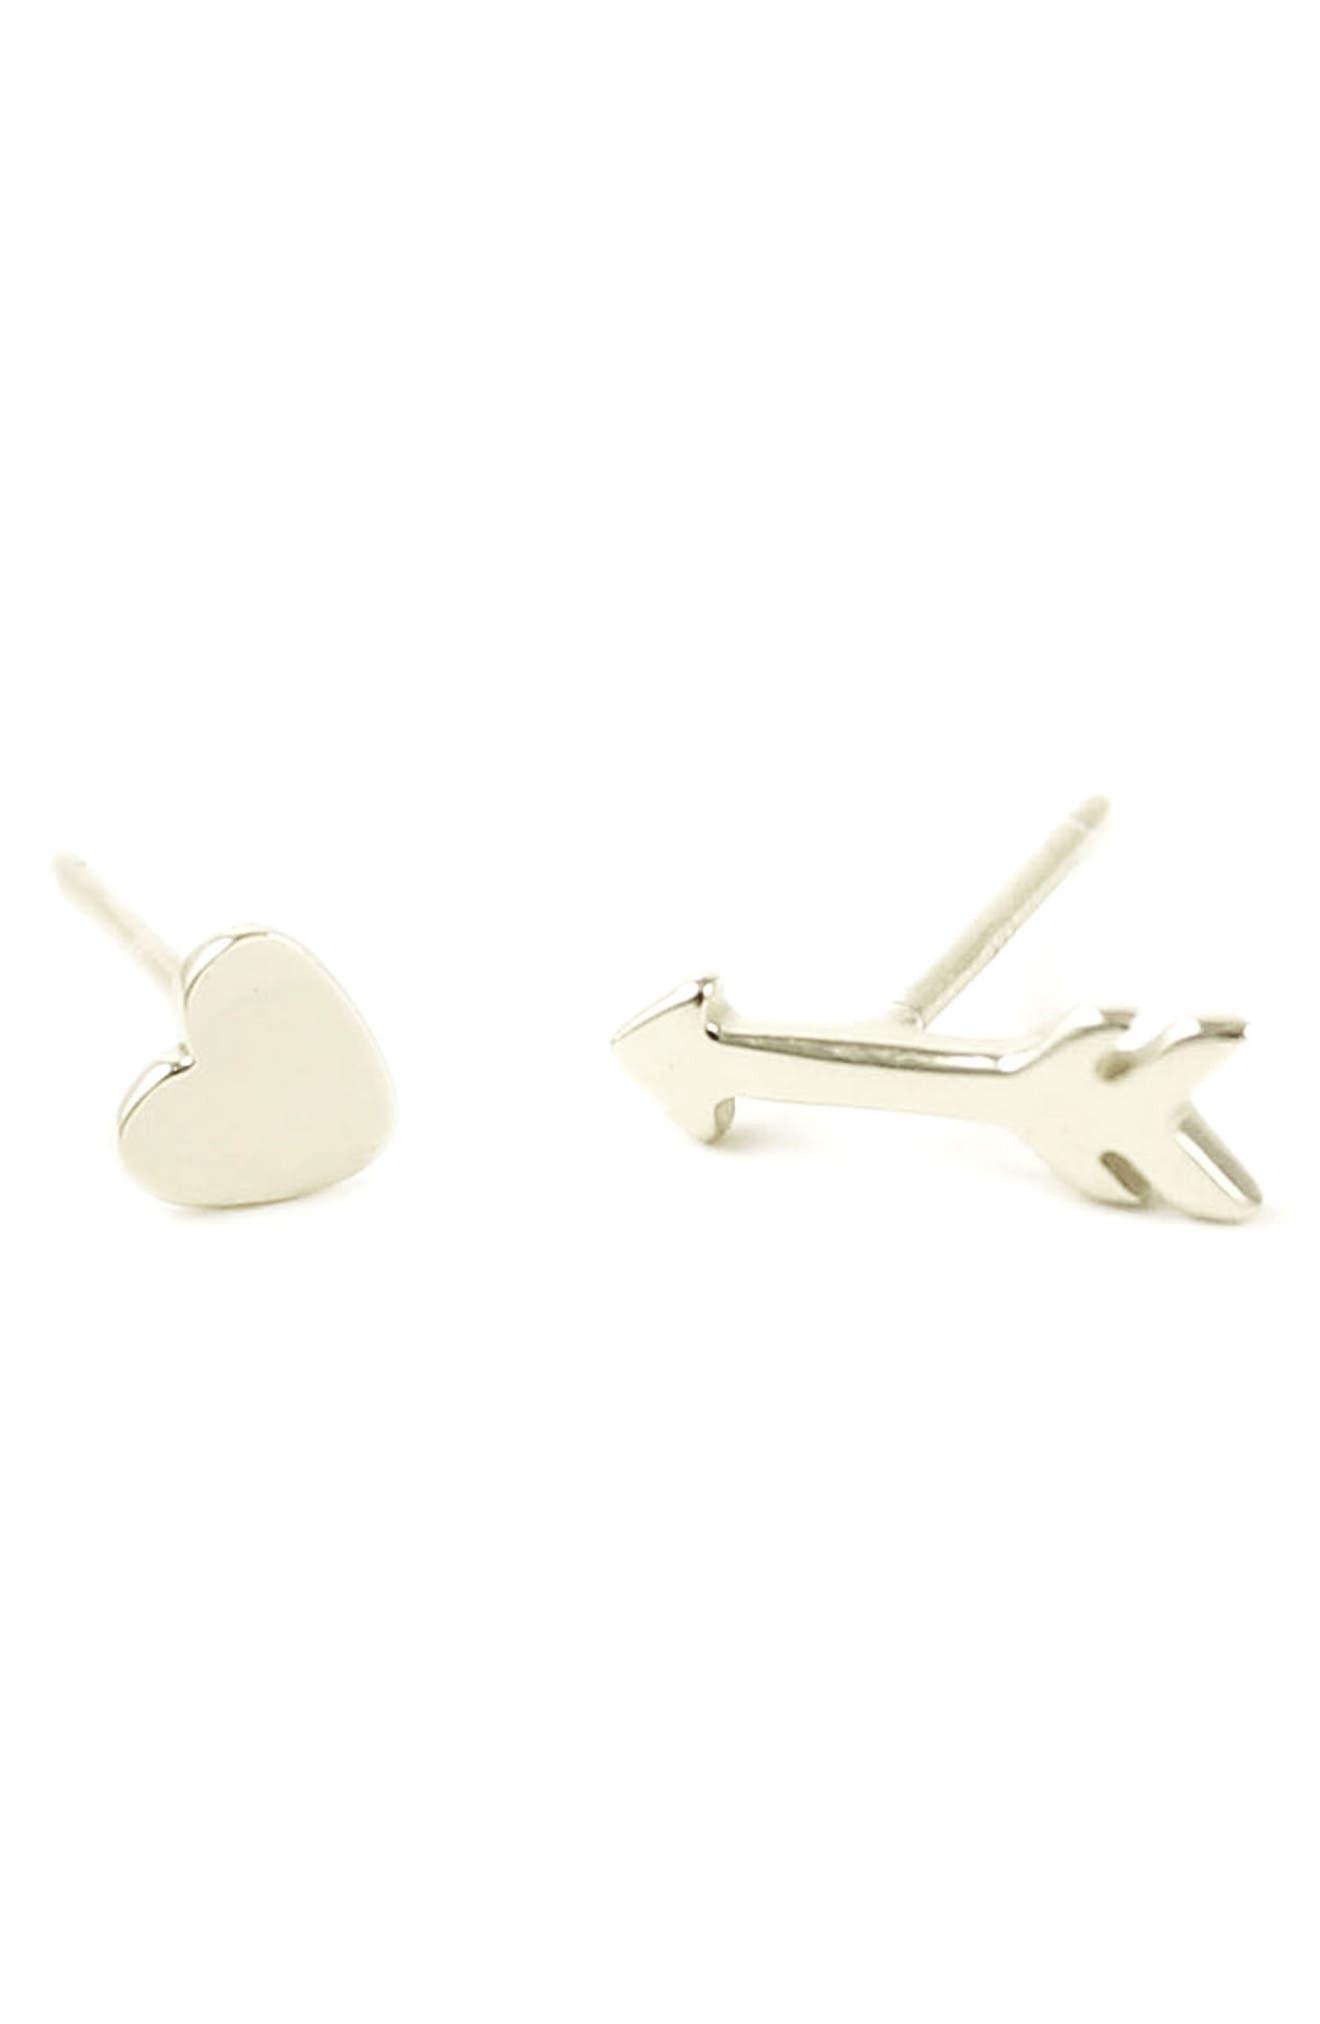 Heart & Arrow Stud Earrings,                         Main,                         color, SILVER